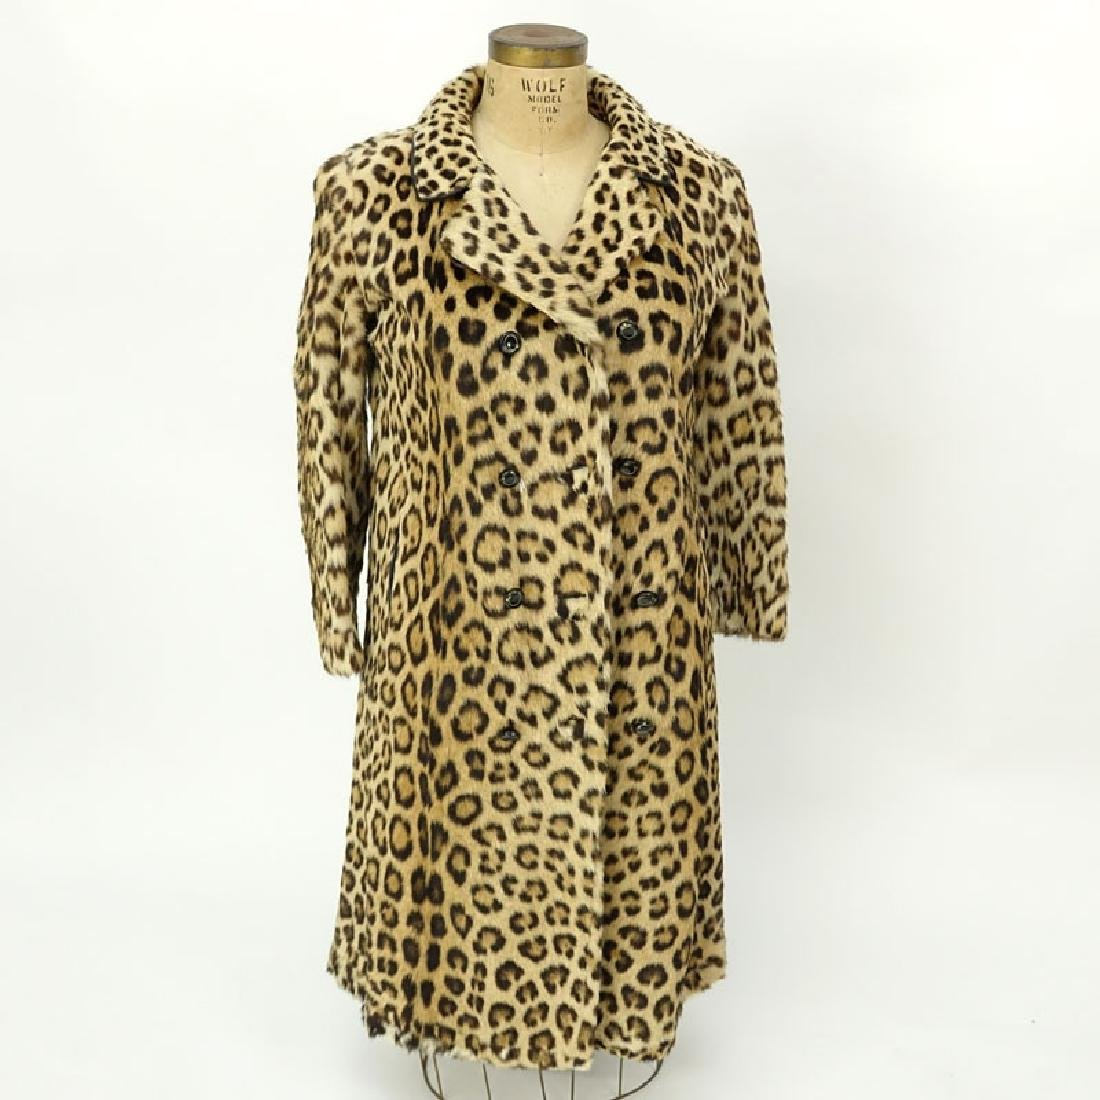 Vintage S. Schiffman Leopard Fur Coat. Fabric lining. - 2